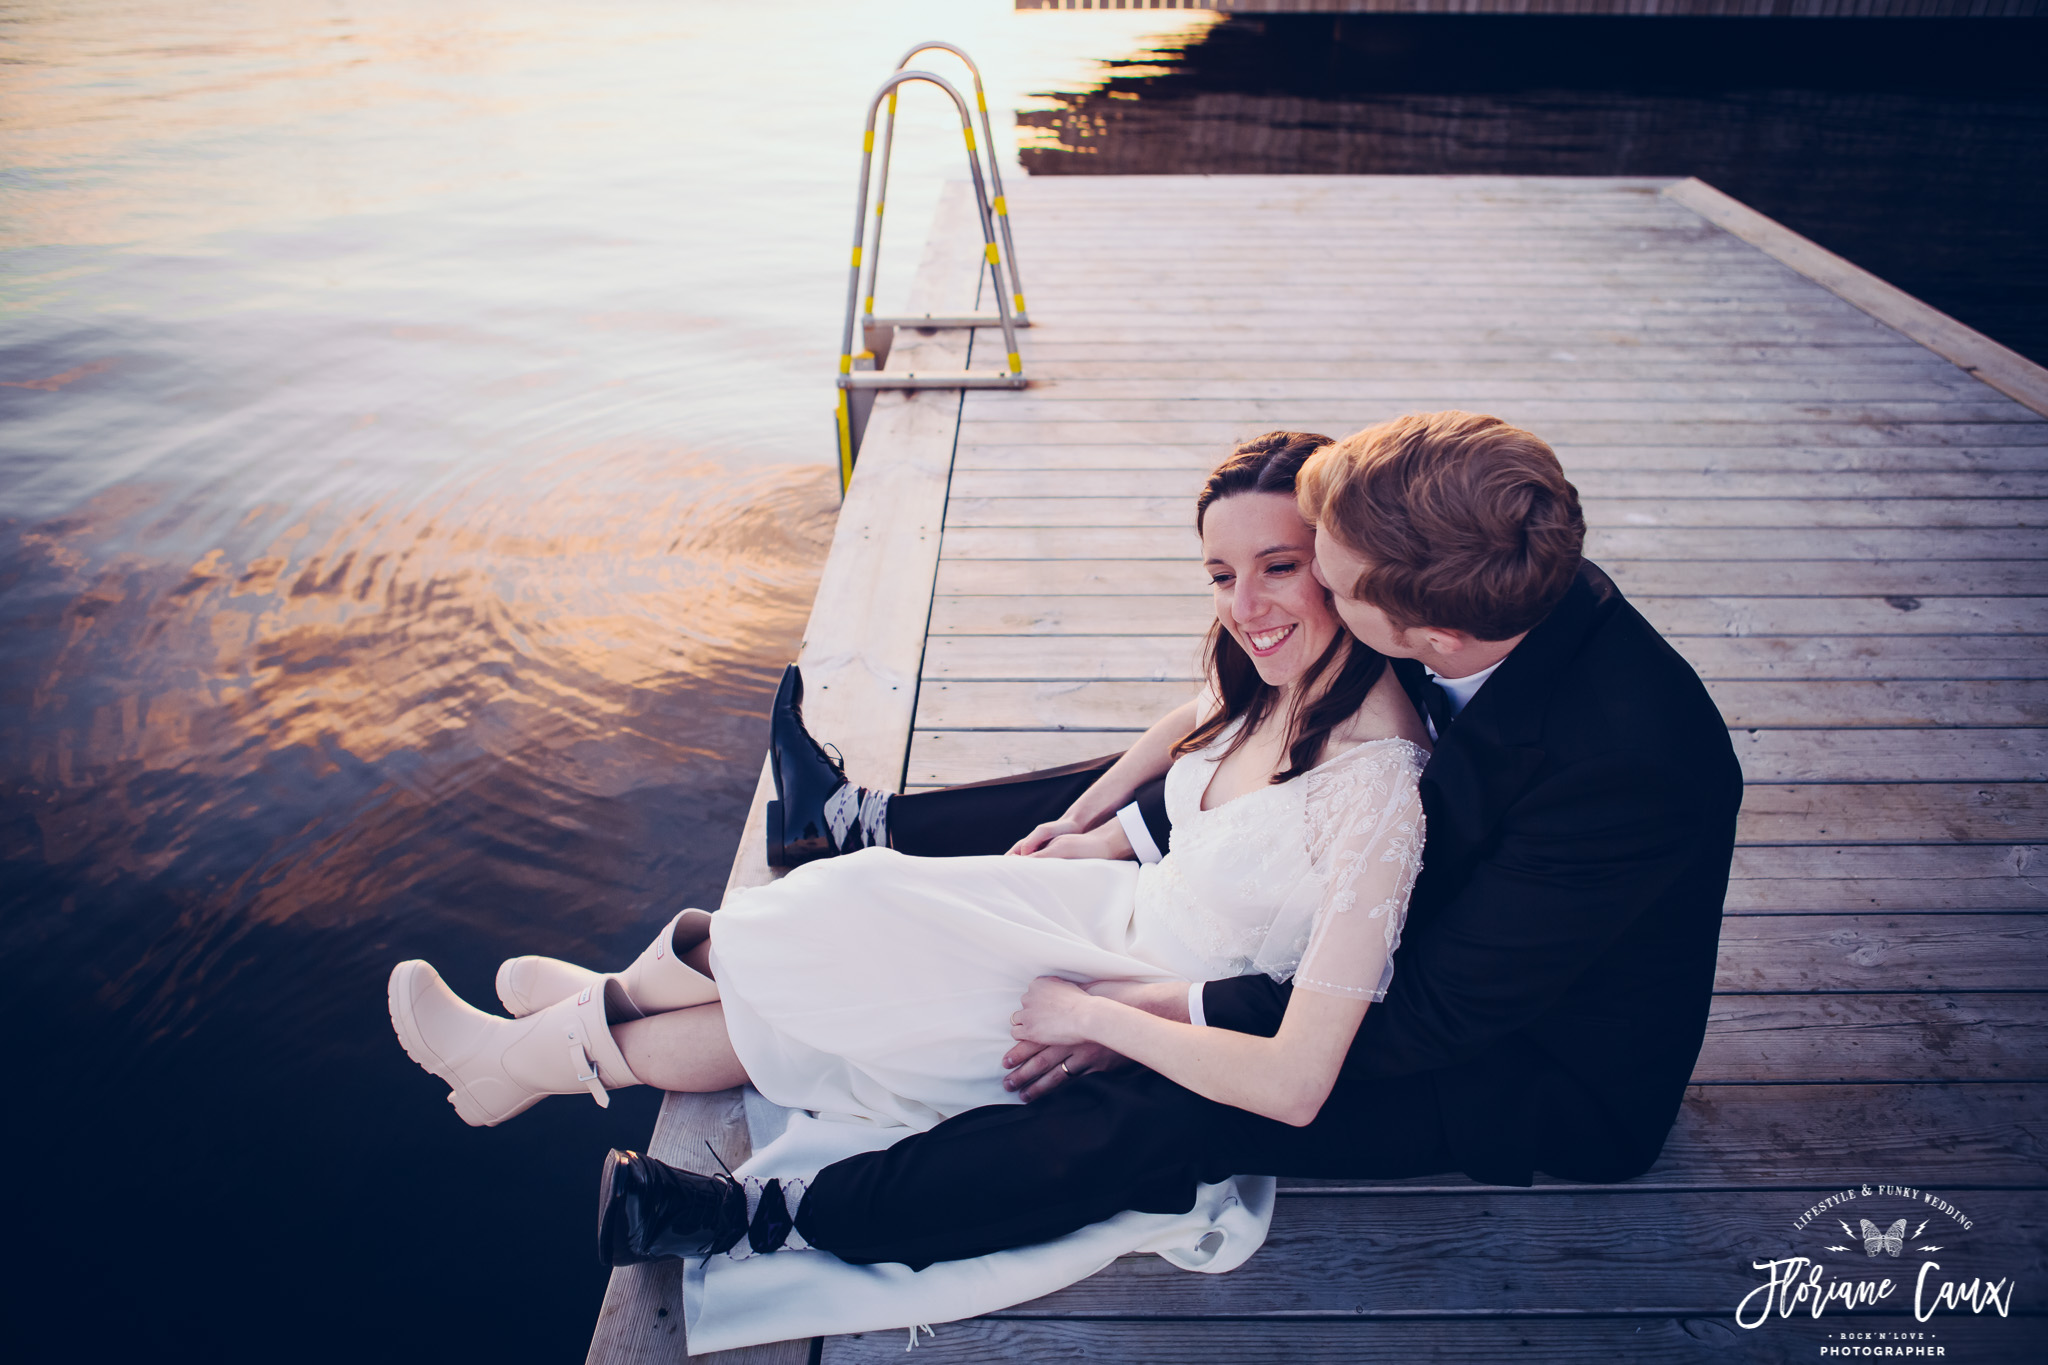 destination-wedding-photographer-oslo-norway-floriane-caux-44